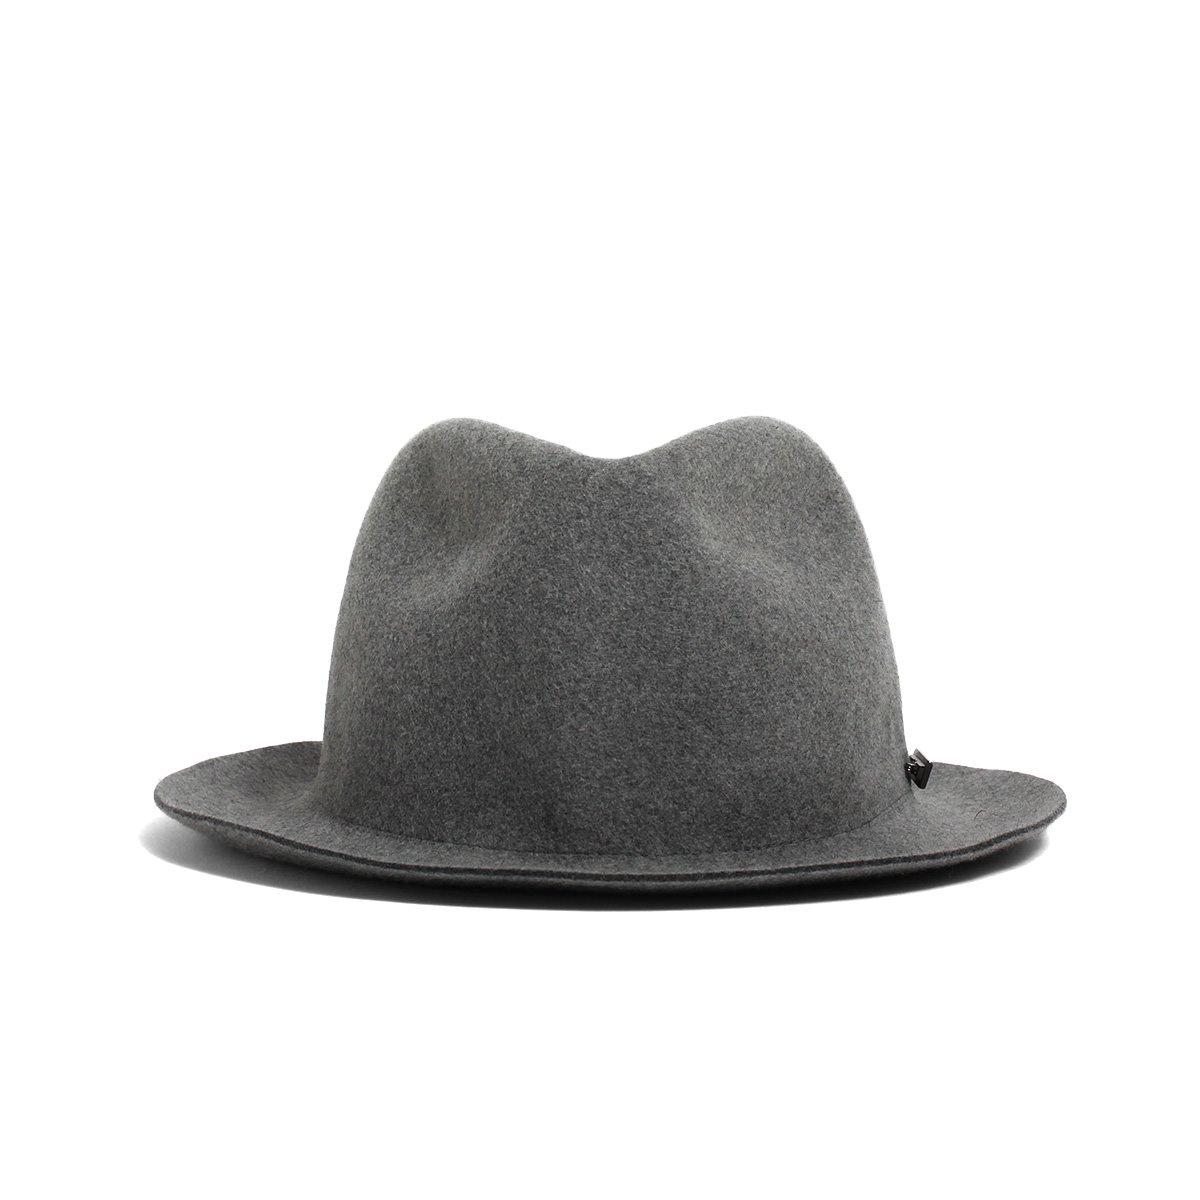 NOMAD FELT HAT SHORT 詳細画像5